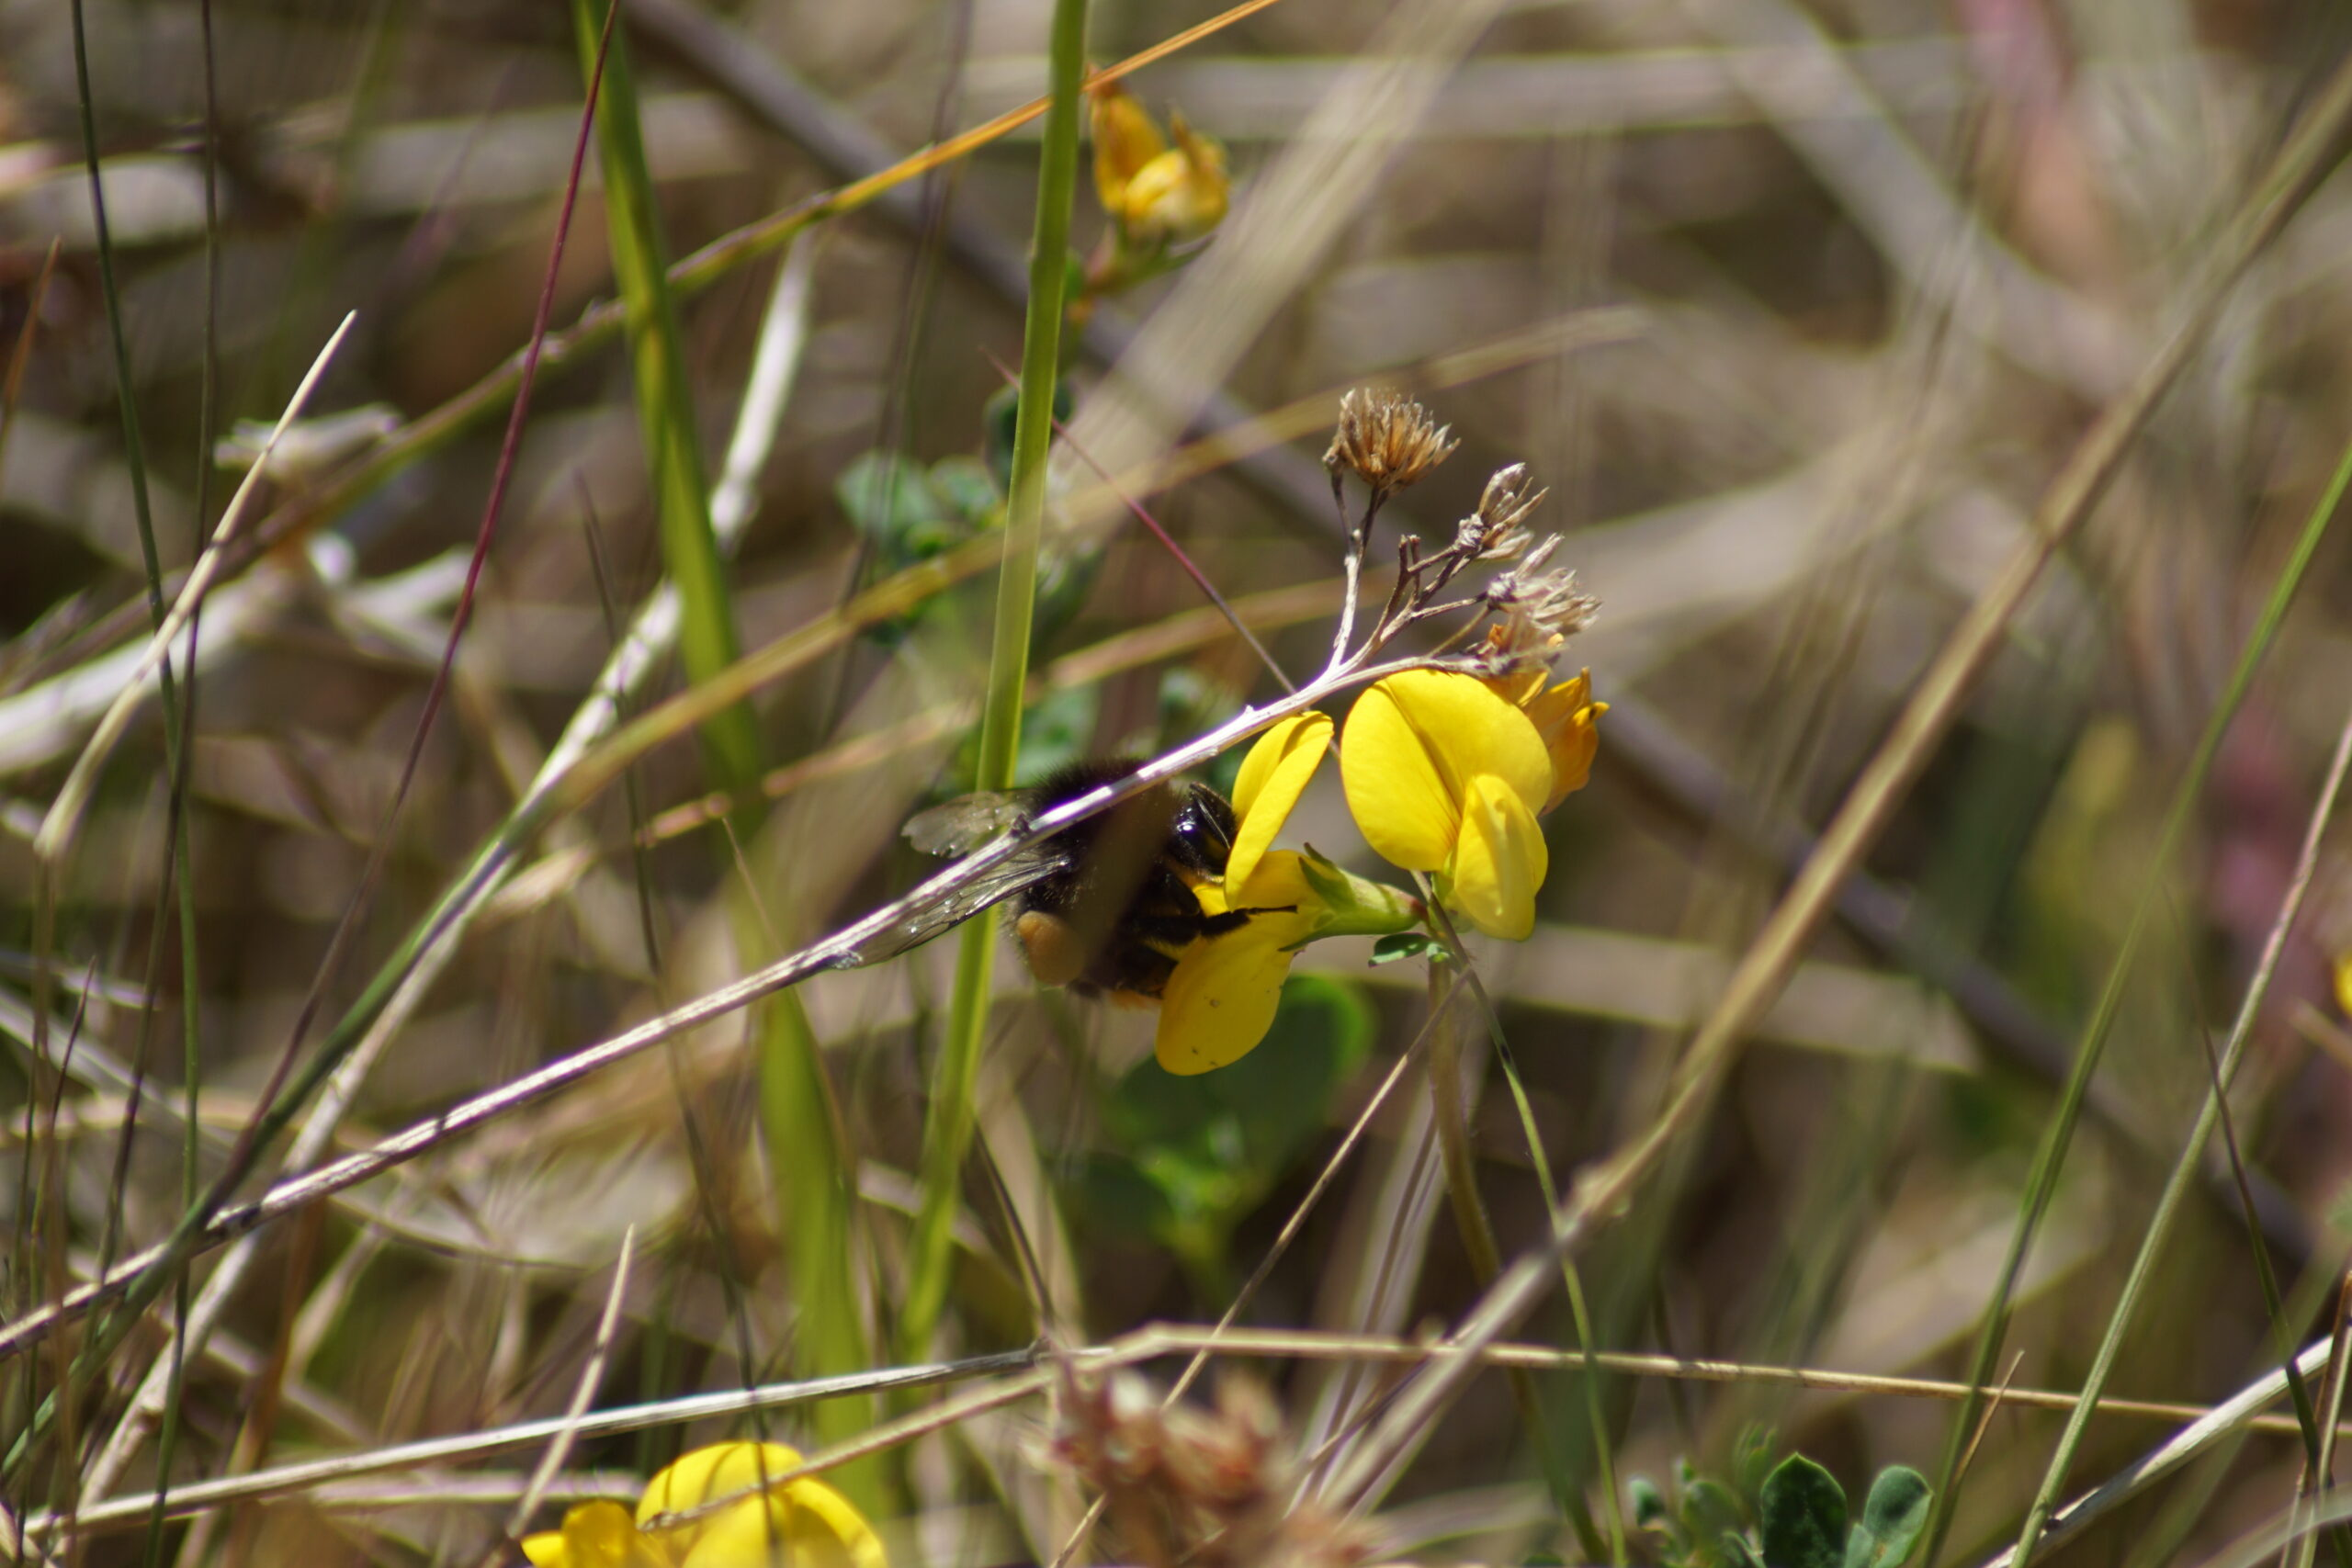 White tailed bumble bee on birdsfoot trefoil